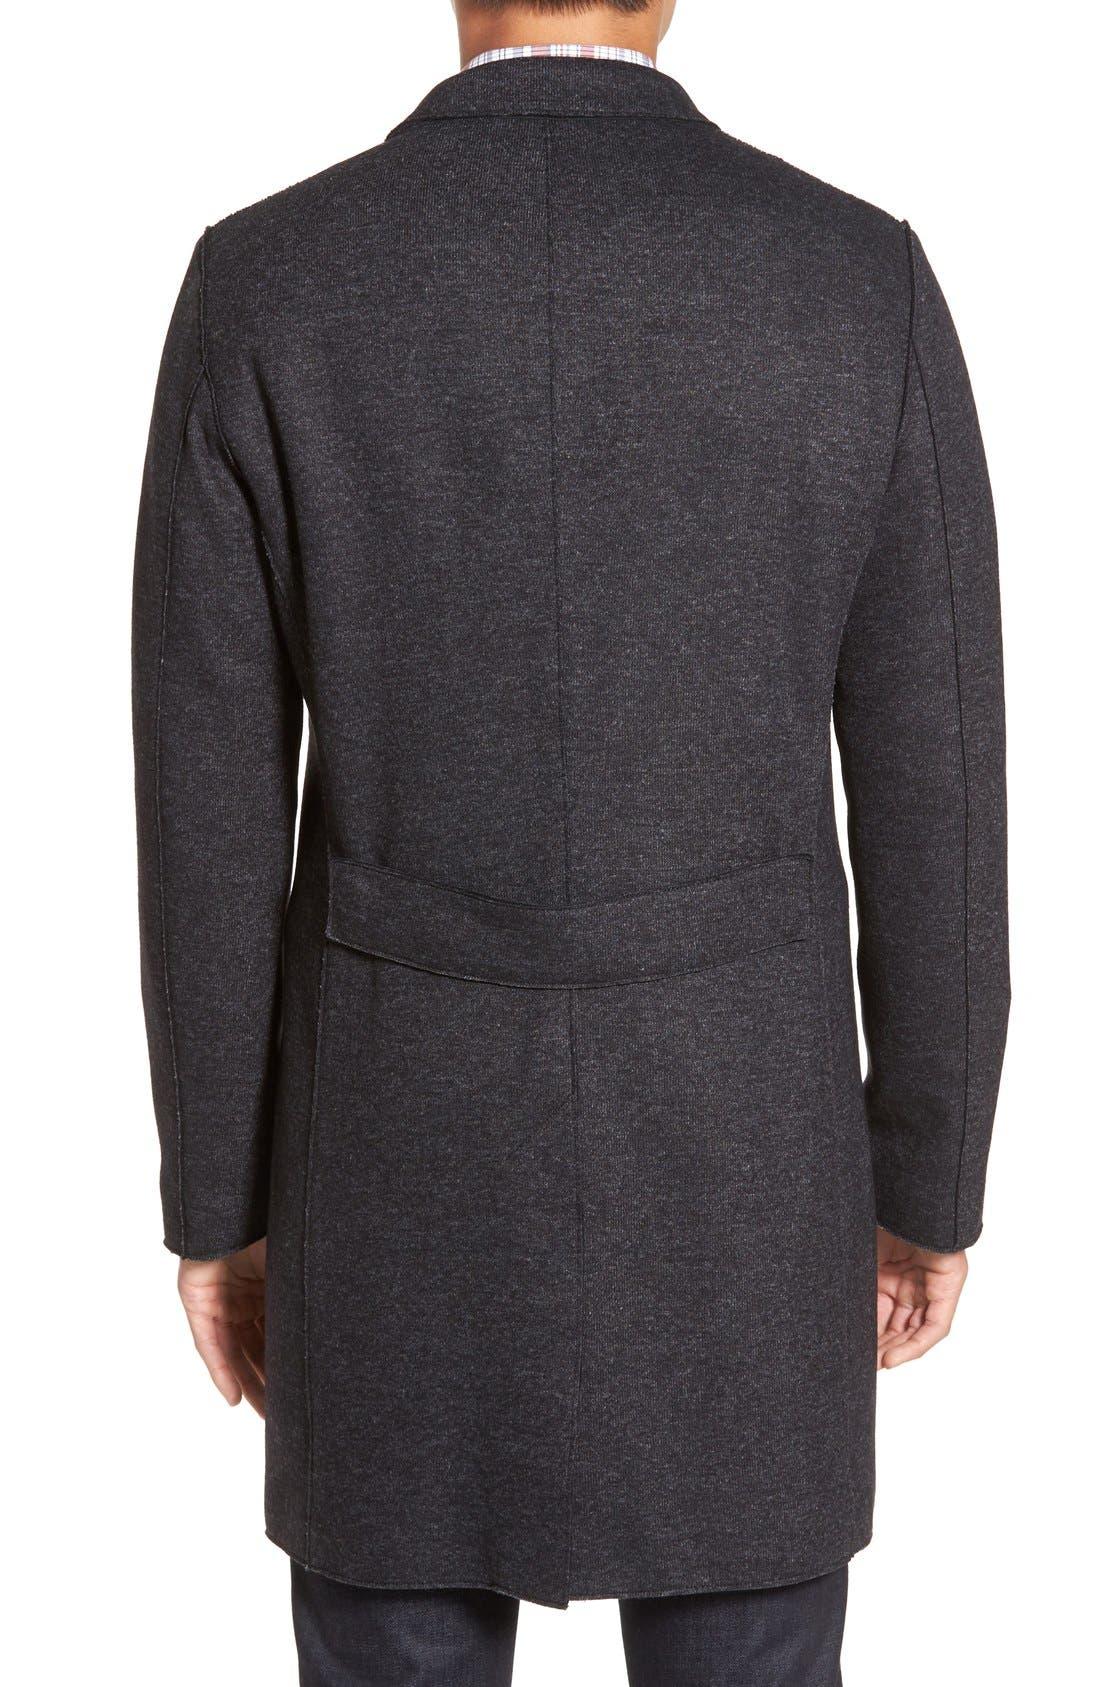 BOSS 'Shawn' Wool Blend Overcoat,                             Alternate thumbnail 2, color,                             402